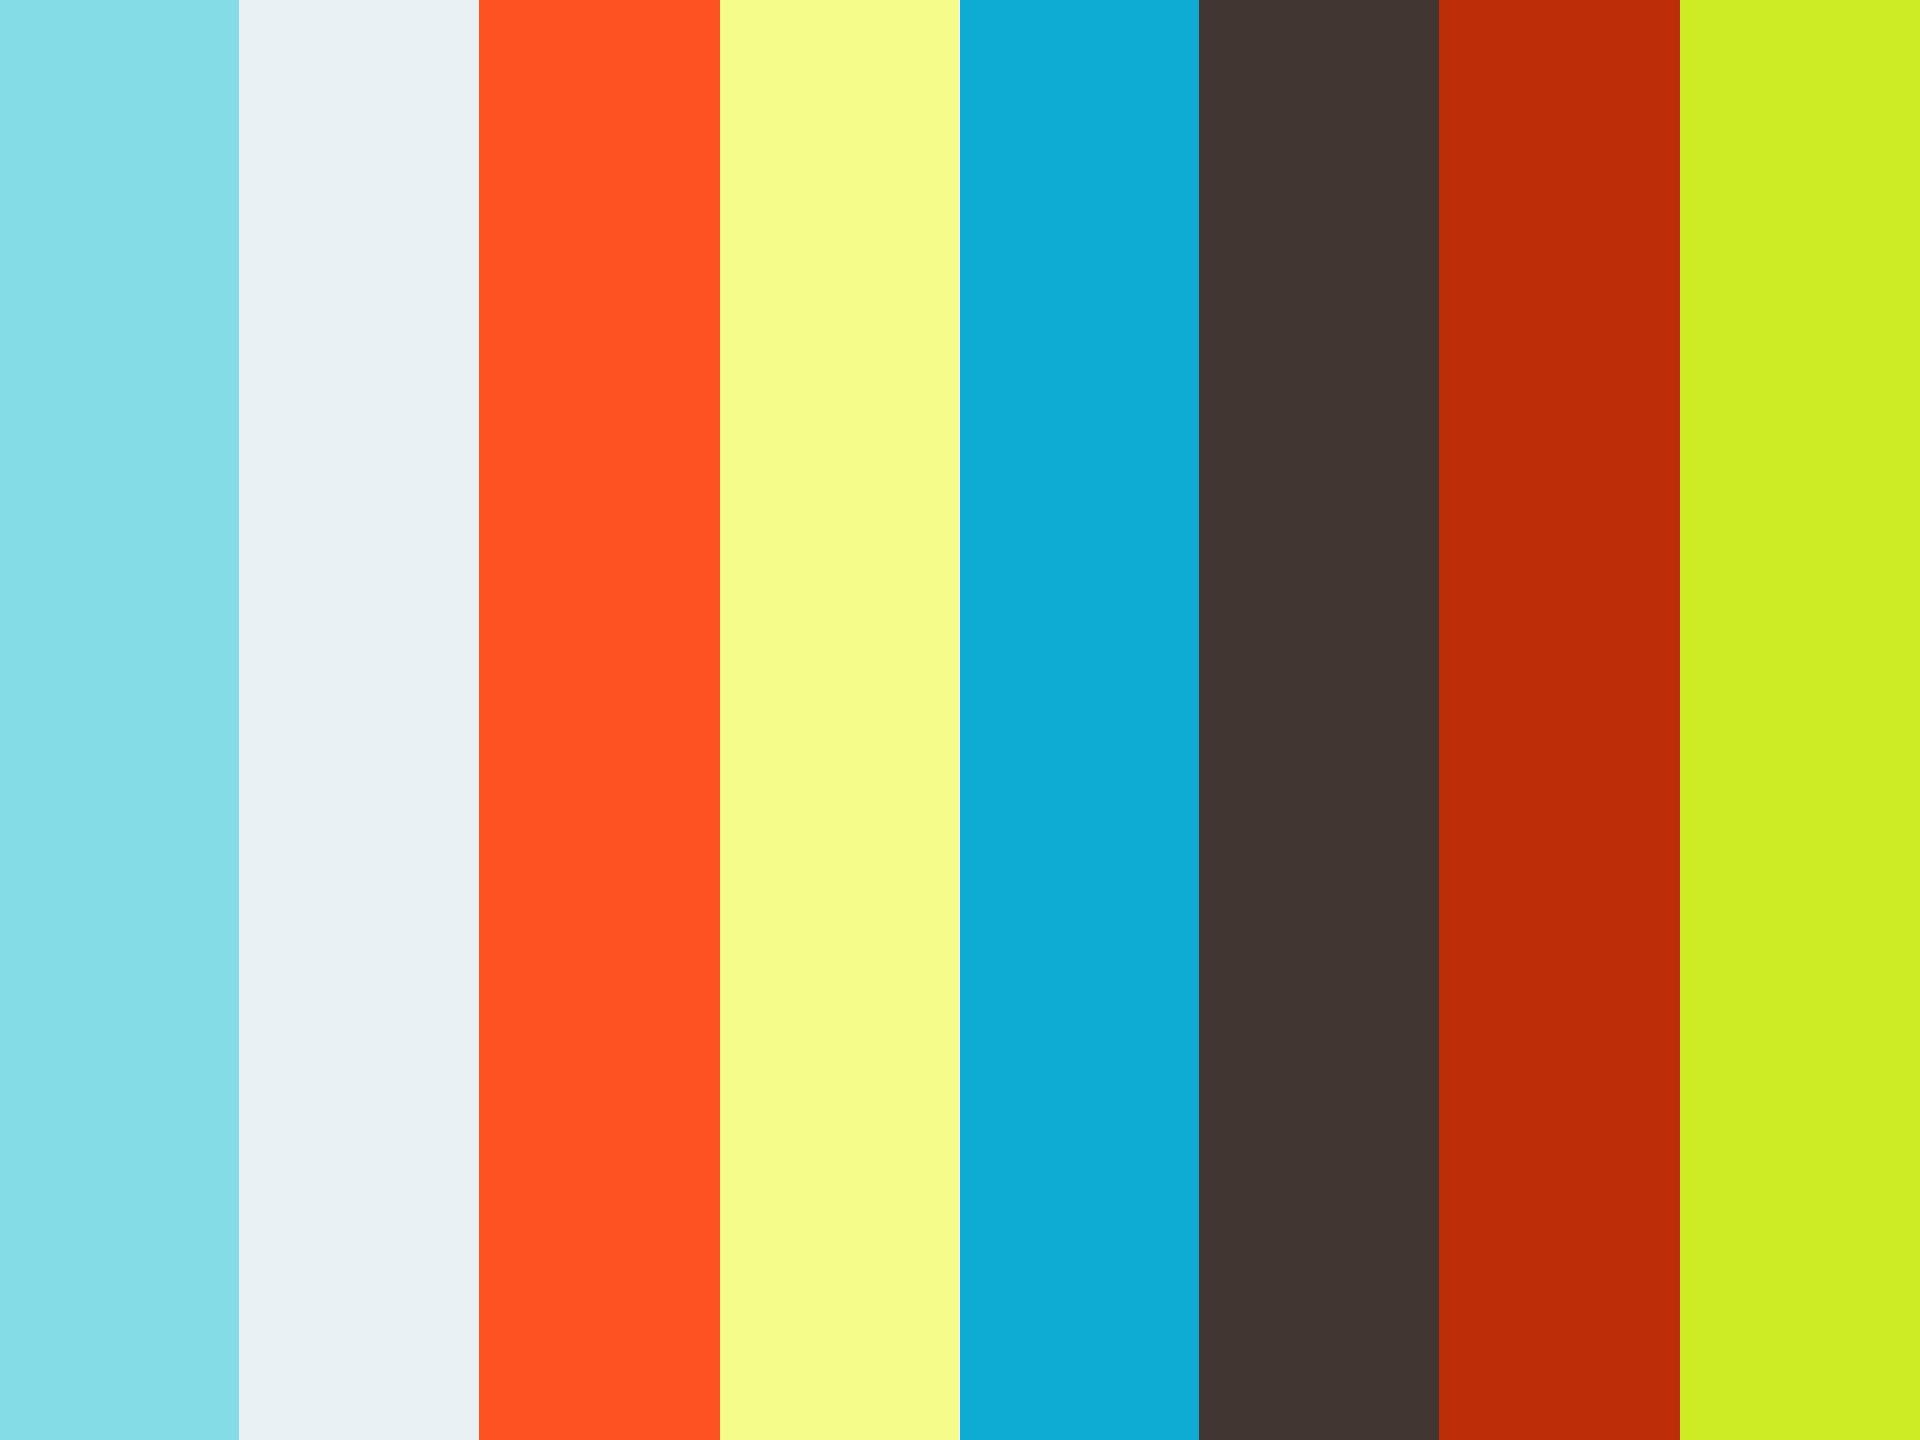 Black Rainbow Living Well Foundation - Start Some Good